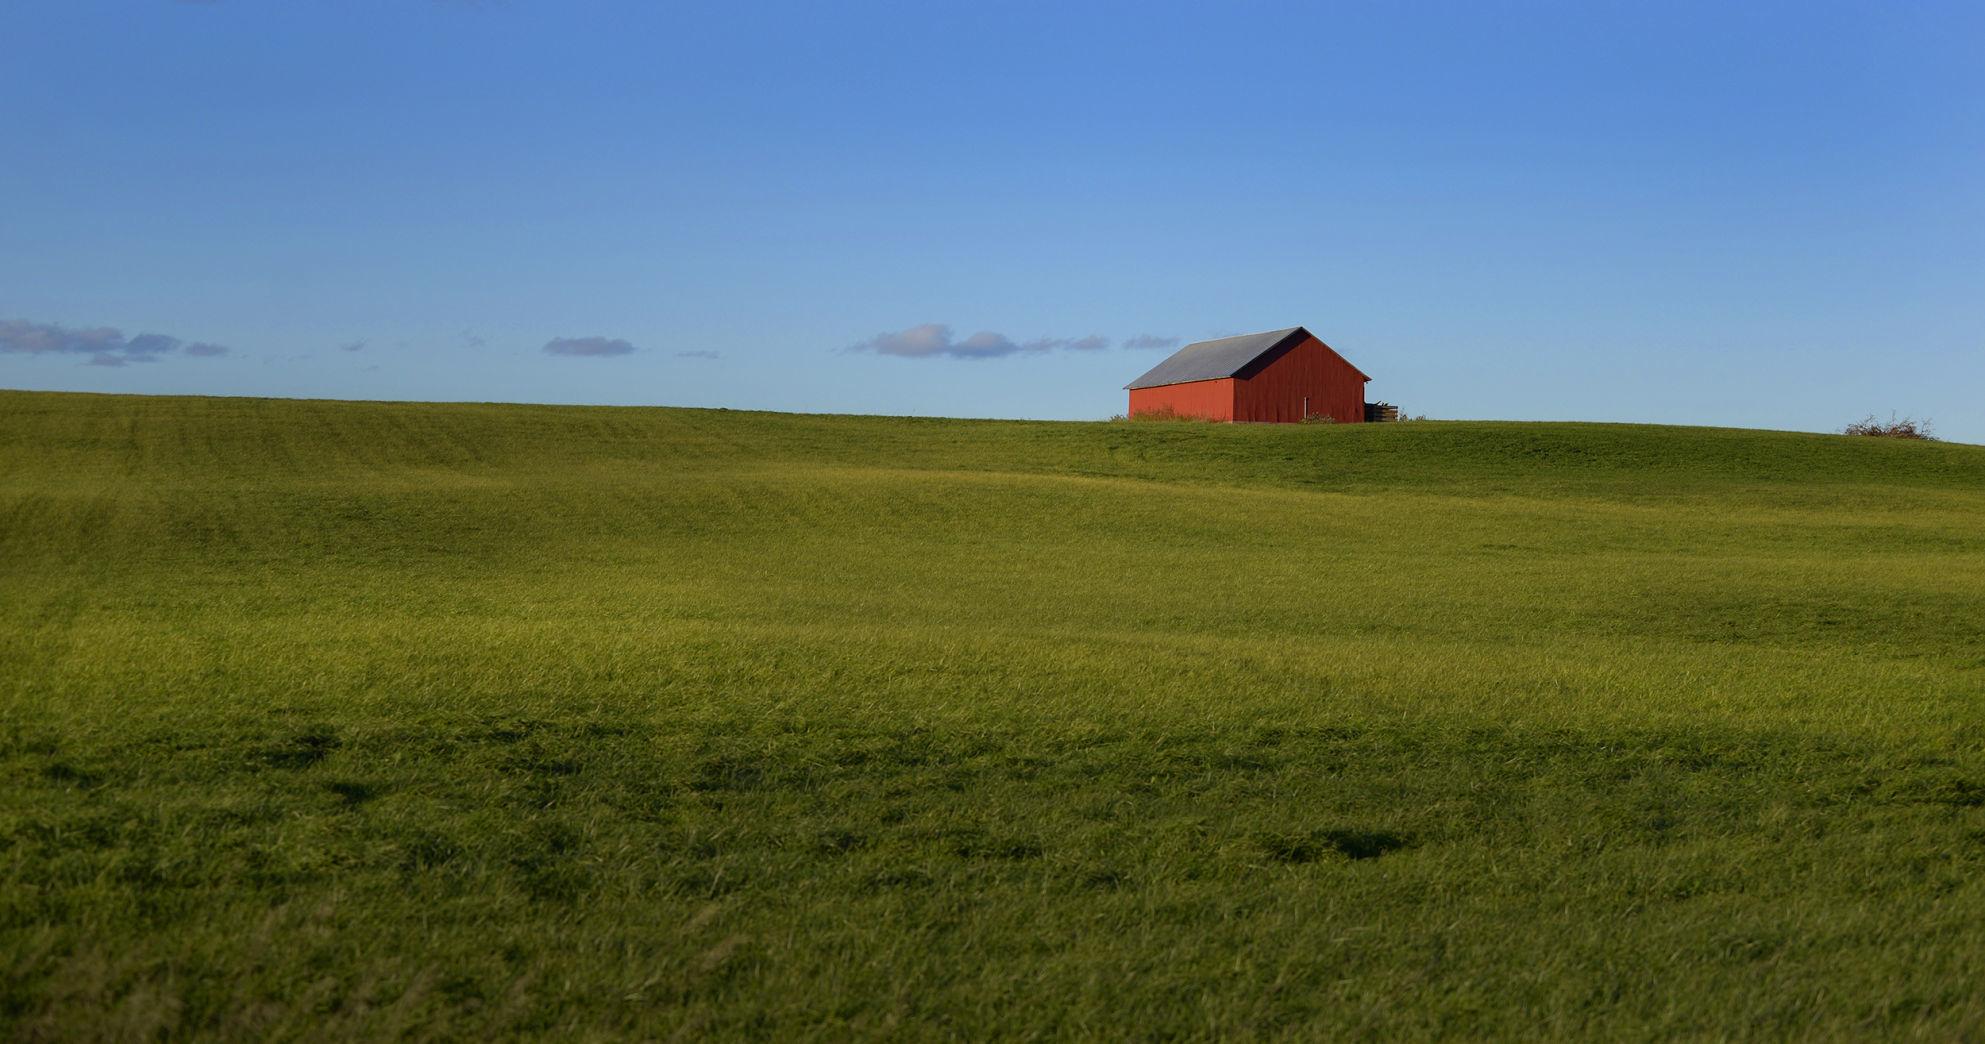 leadertelegram.com - Nate Jackson The Country Today - Study: Farmland under threat